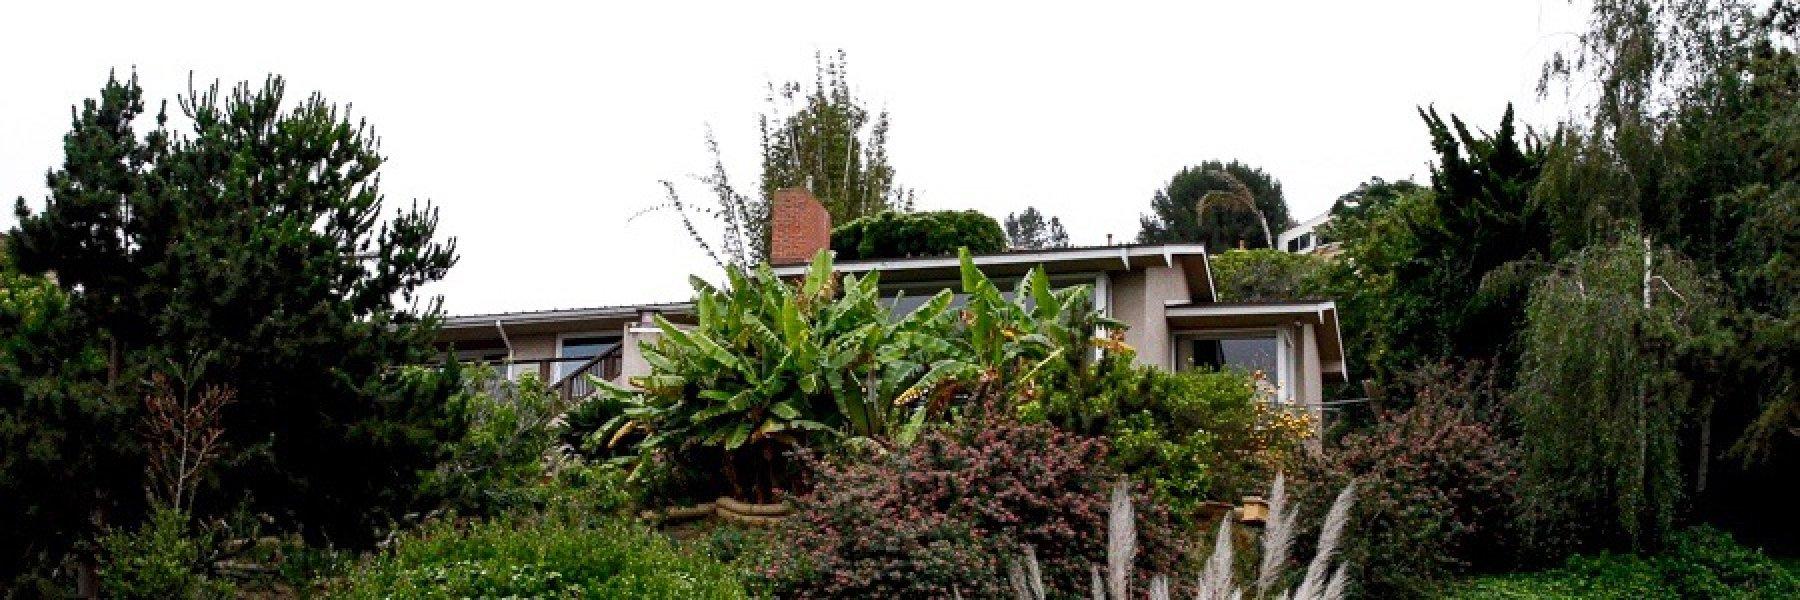 Hidden Valley is a community of homes in La Jolla California